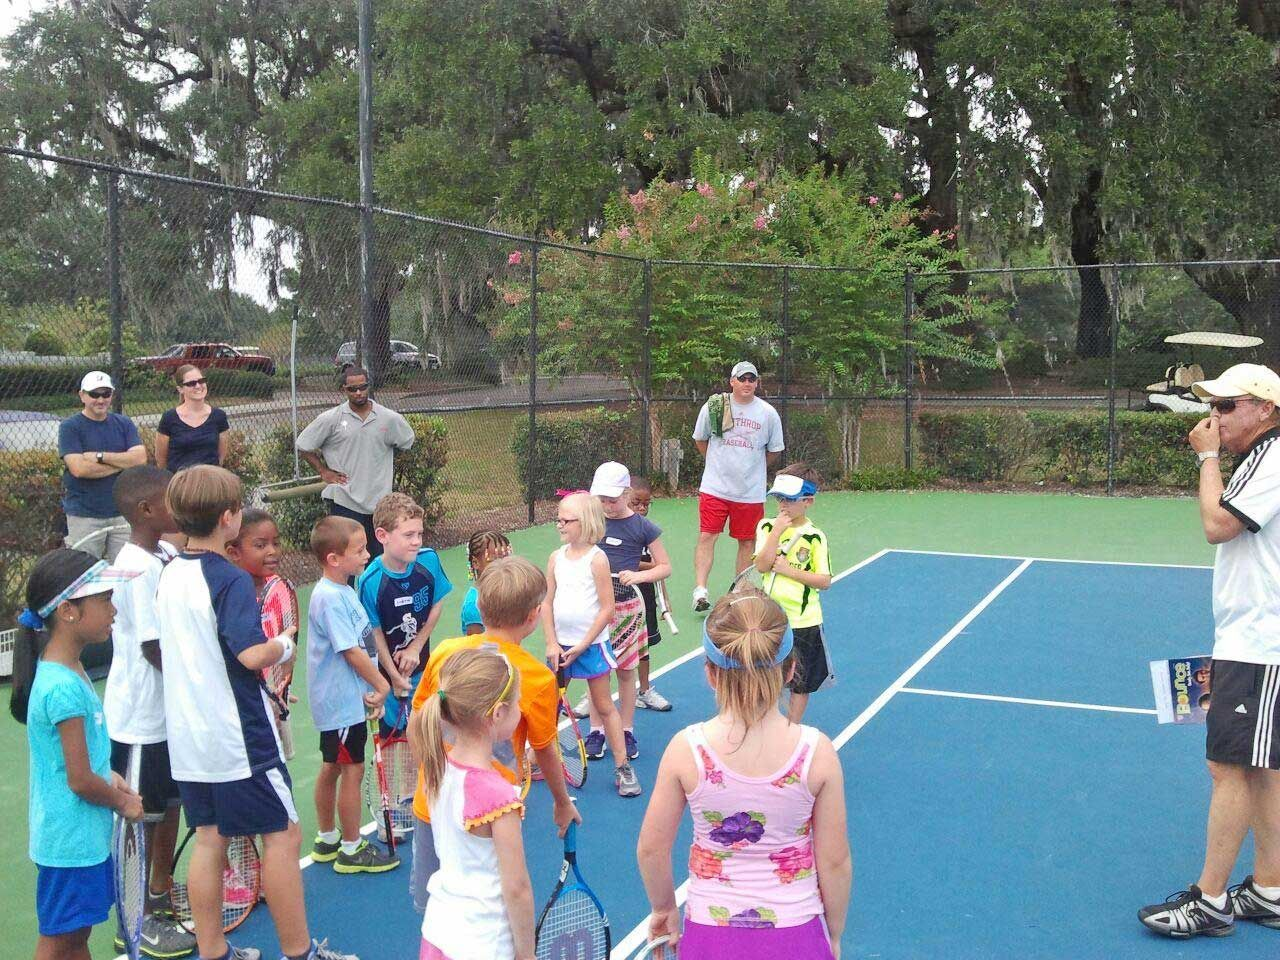 Nickelodean kids tennis day at legend oaks summer swim